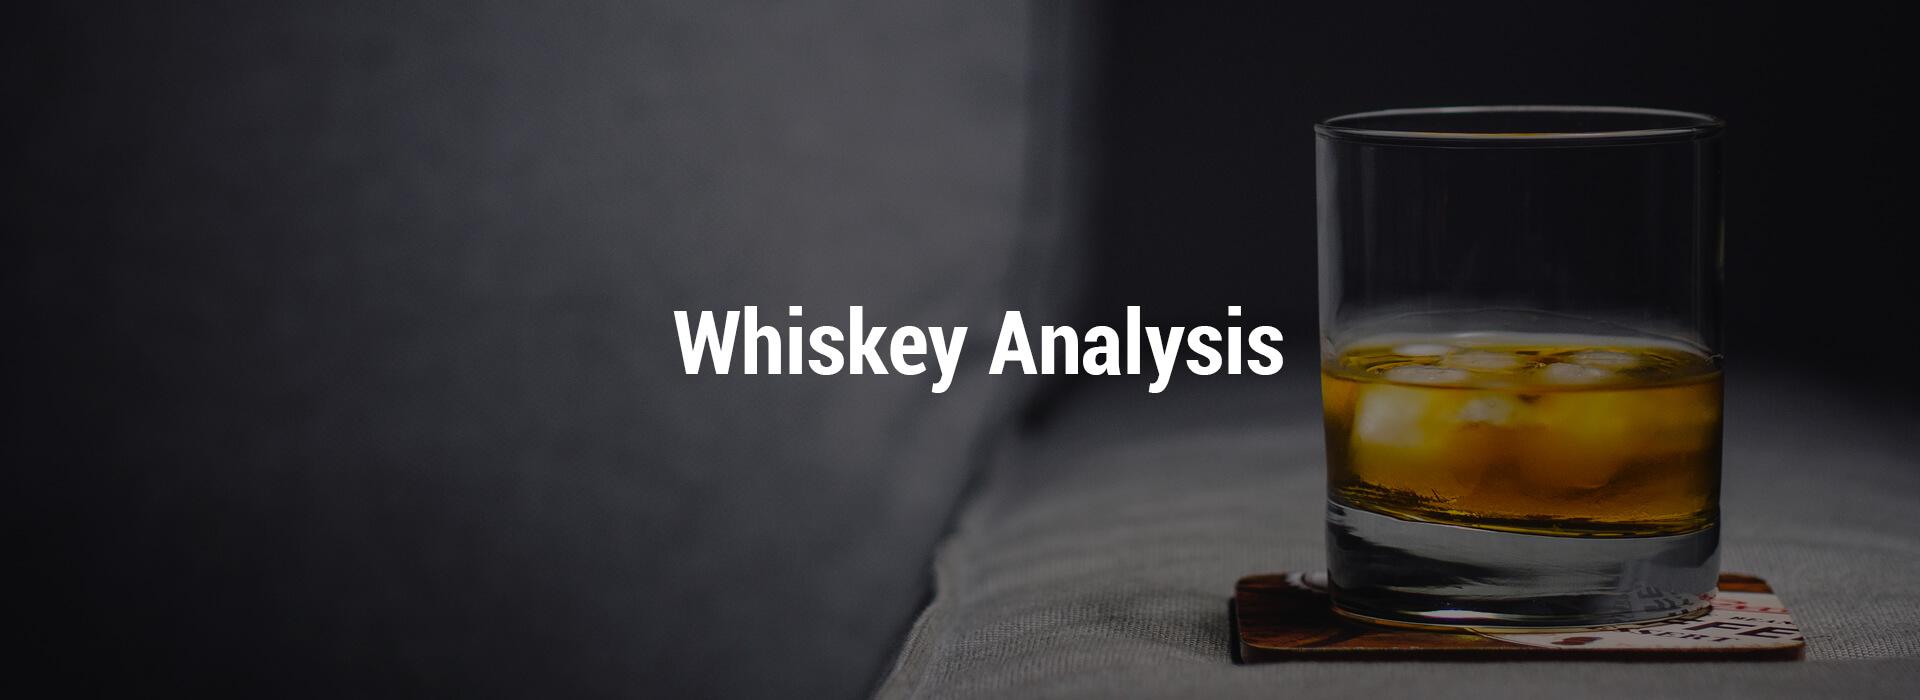 SP-Whiskey-header-1